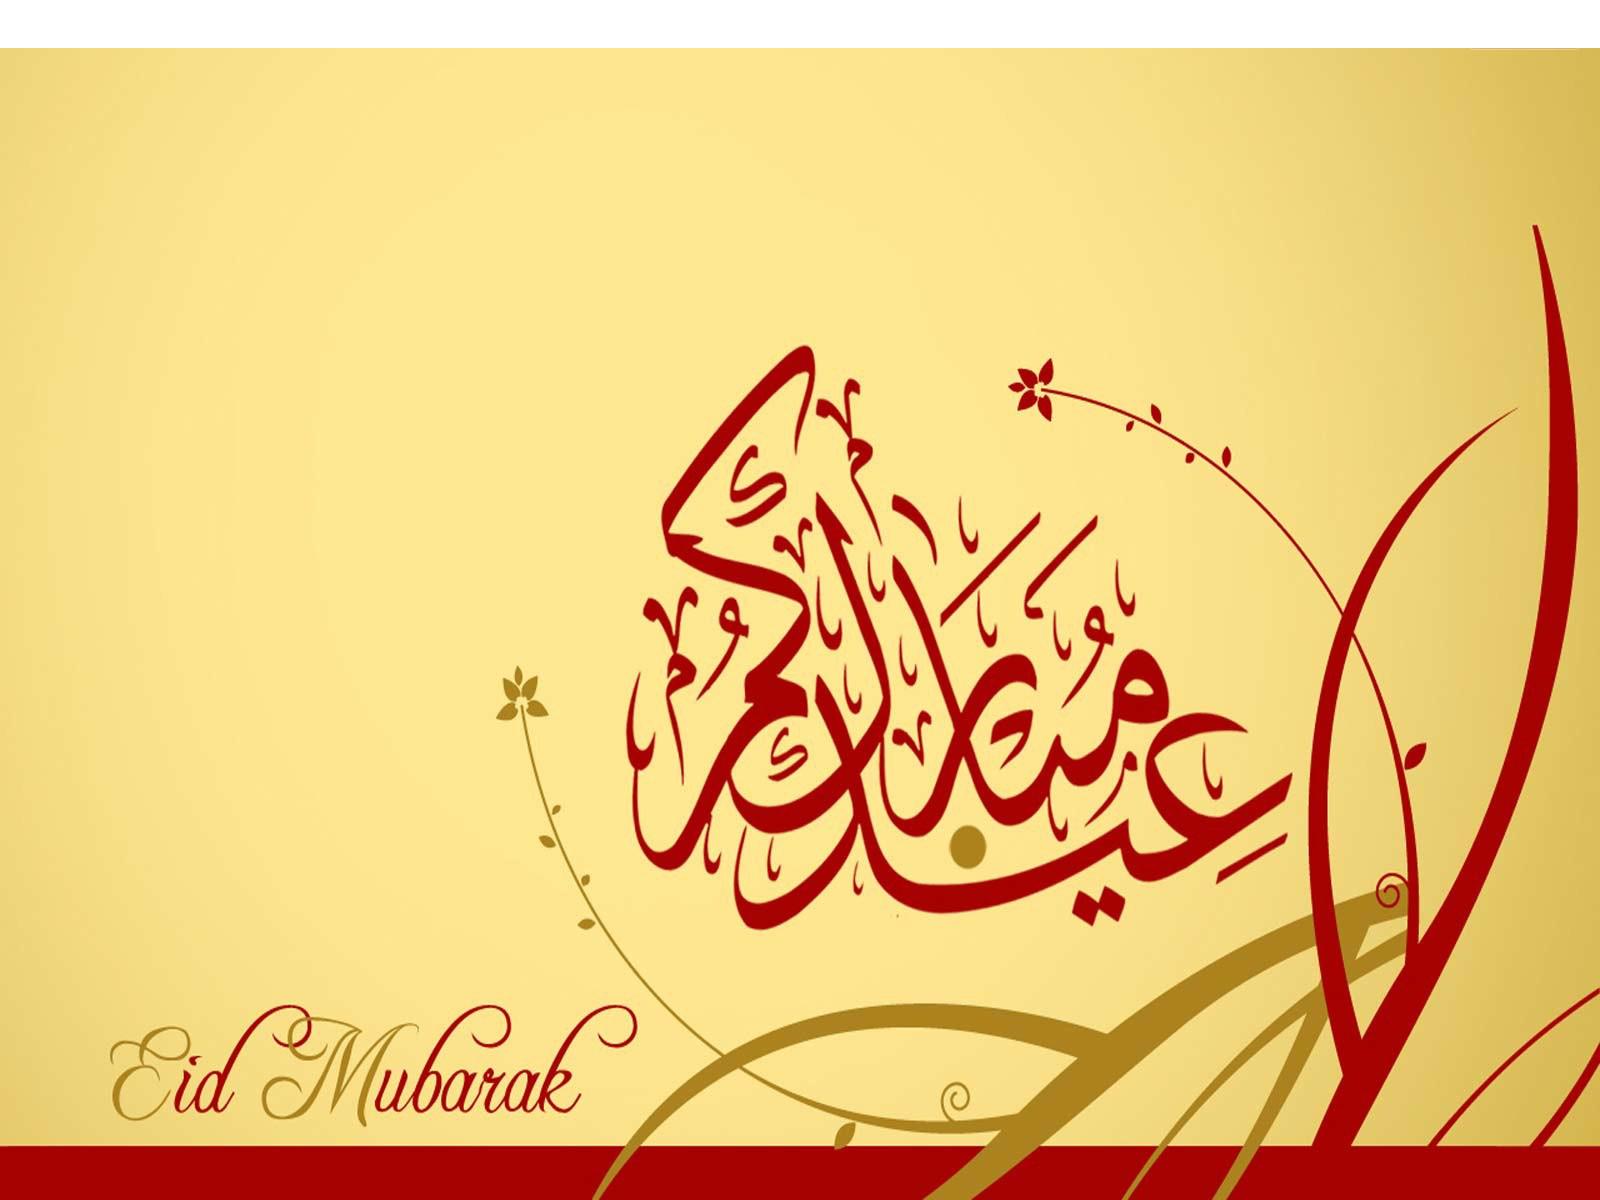 http://3.bp.blogspot.com/-HWFgkPivqTo/UC3ZPYyO9SI/AAAAAAAACBI/oOi_SHm7V8s/s1600/Beautiful+EID+Wallpaper.jpg